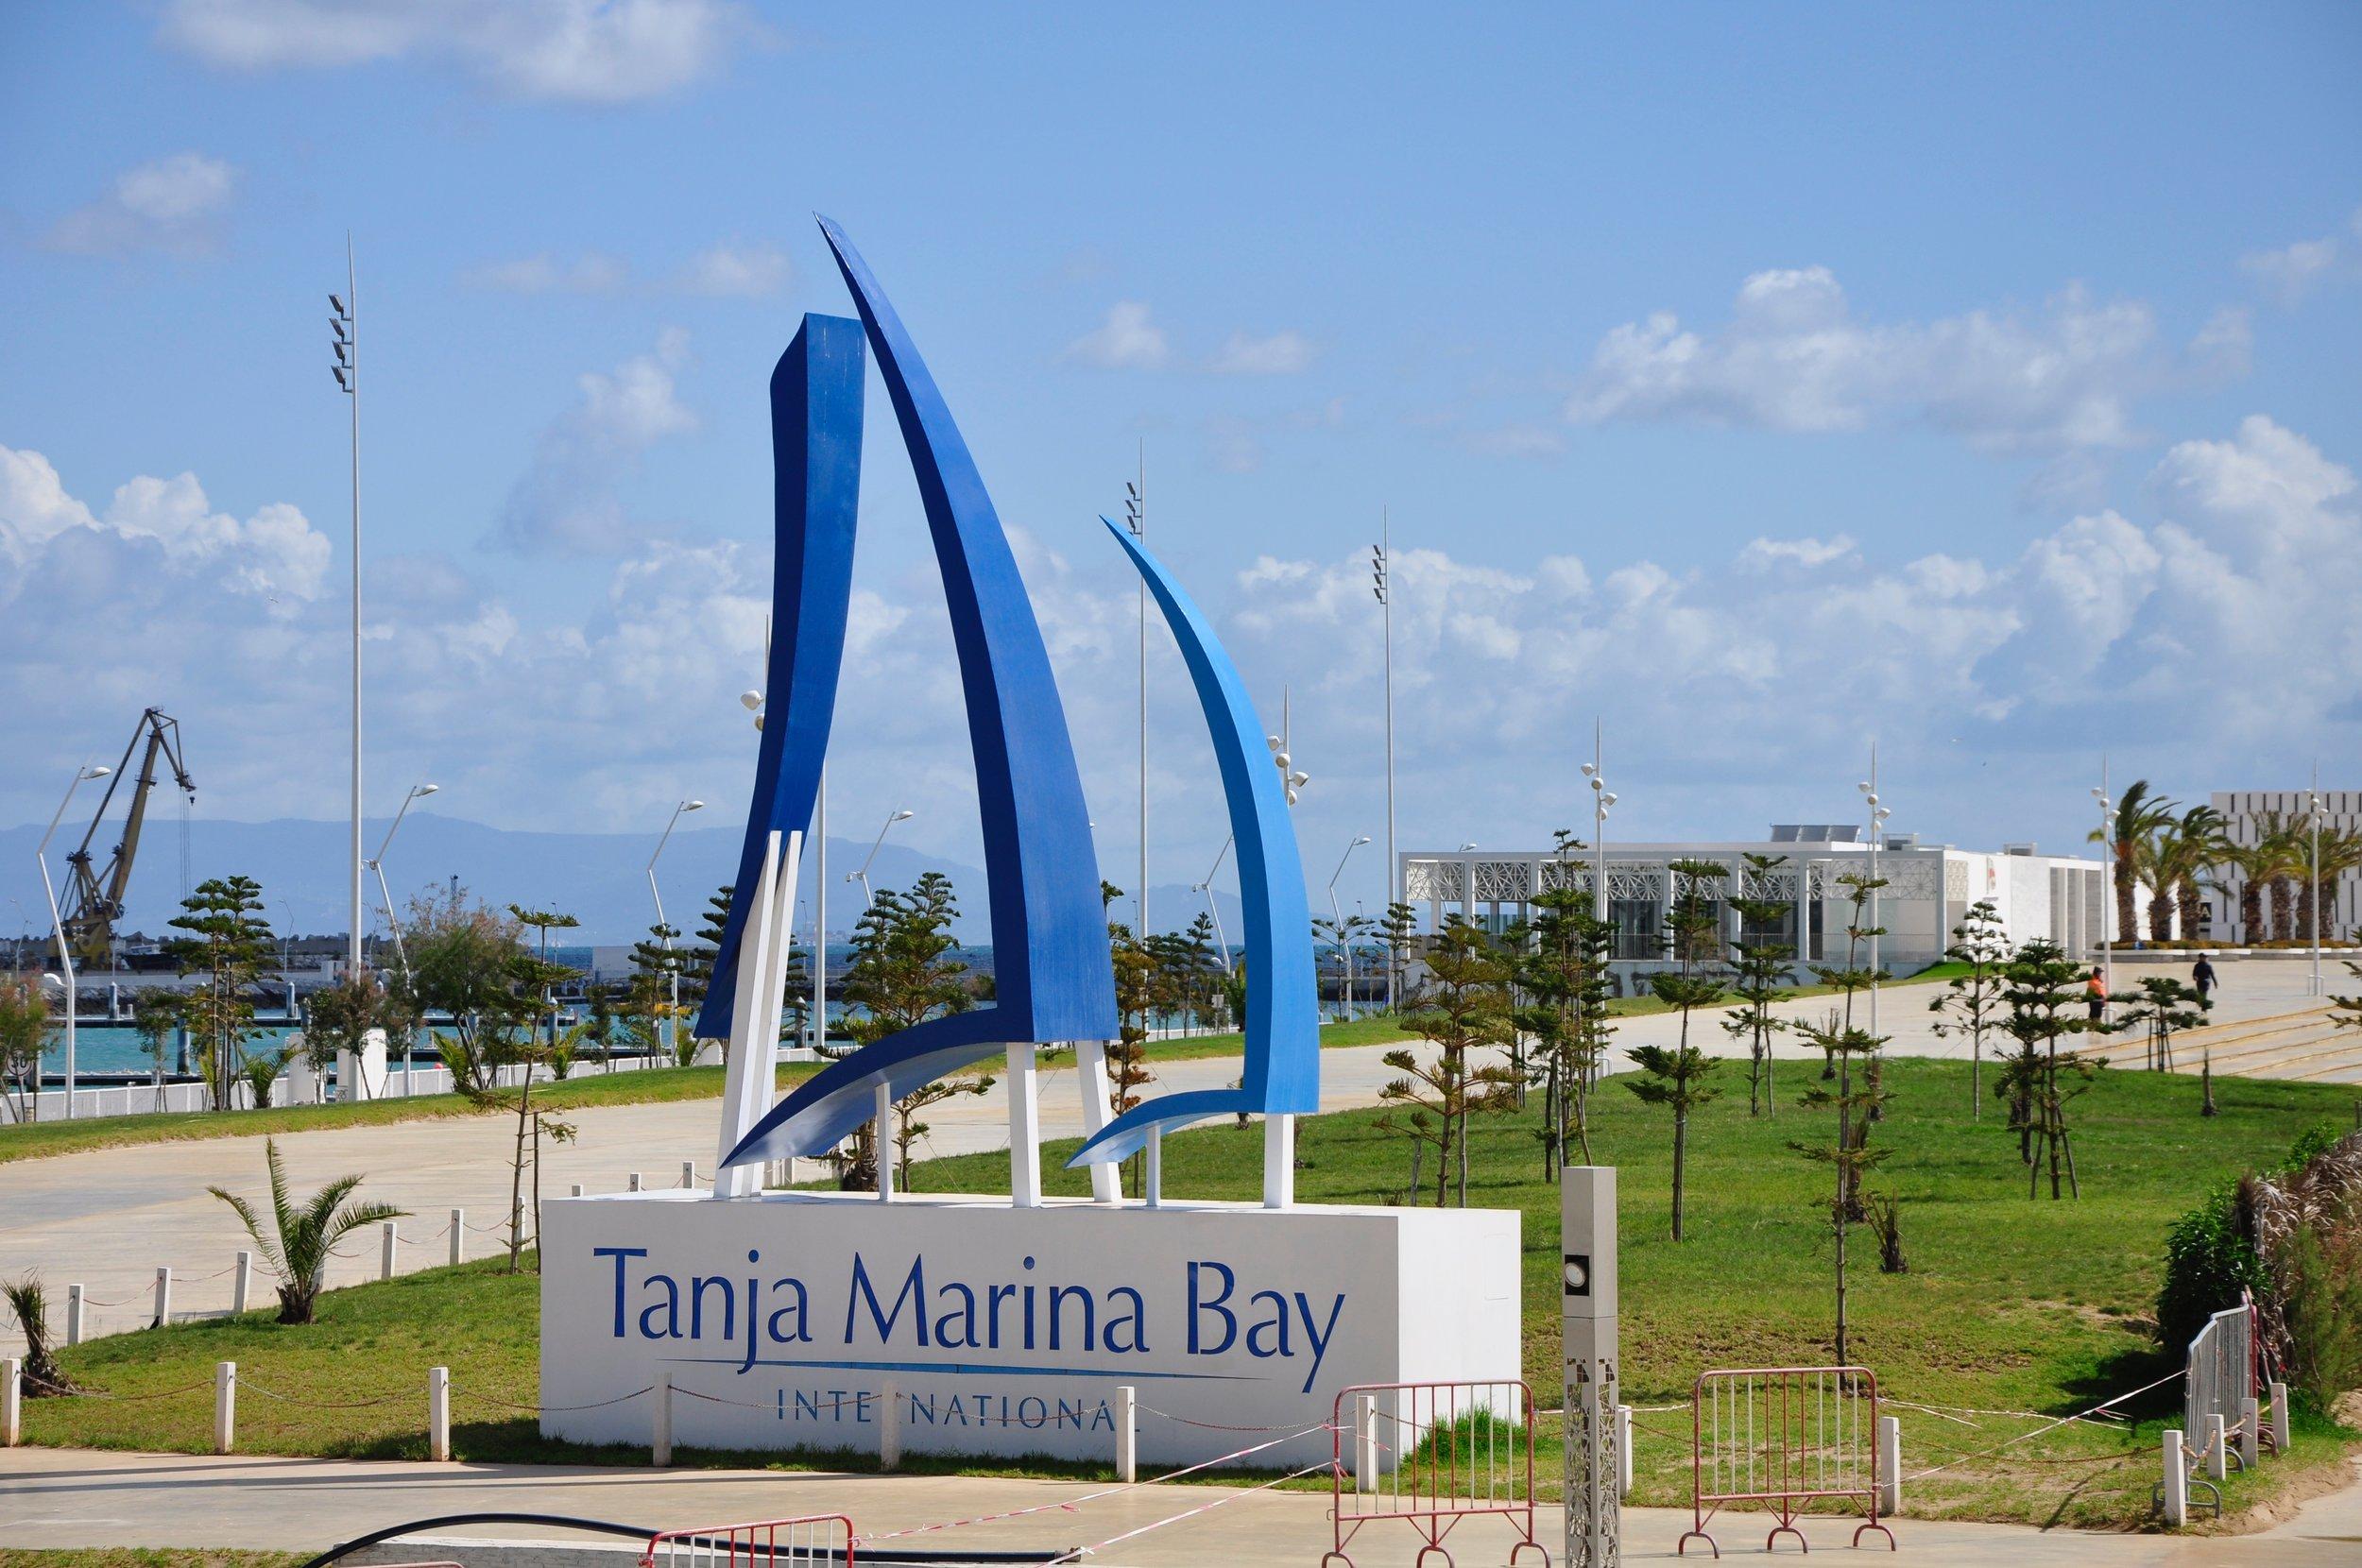 Tanja Marina Bay Tangier